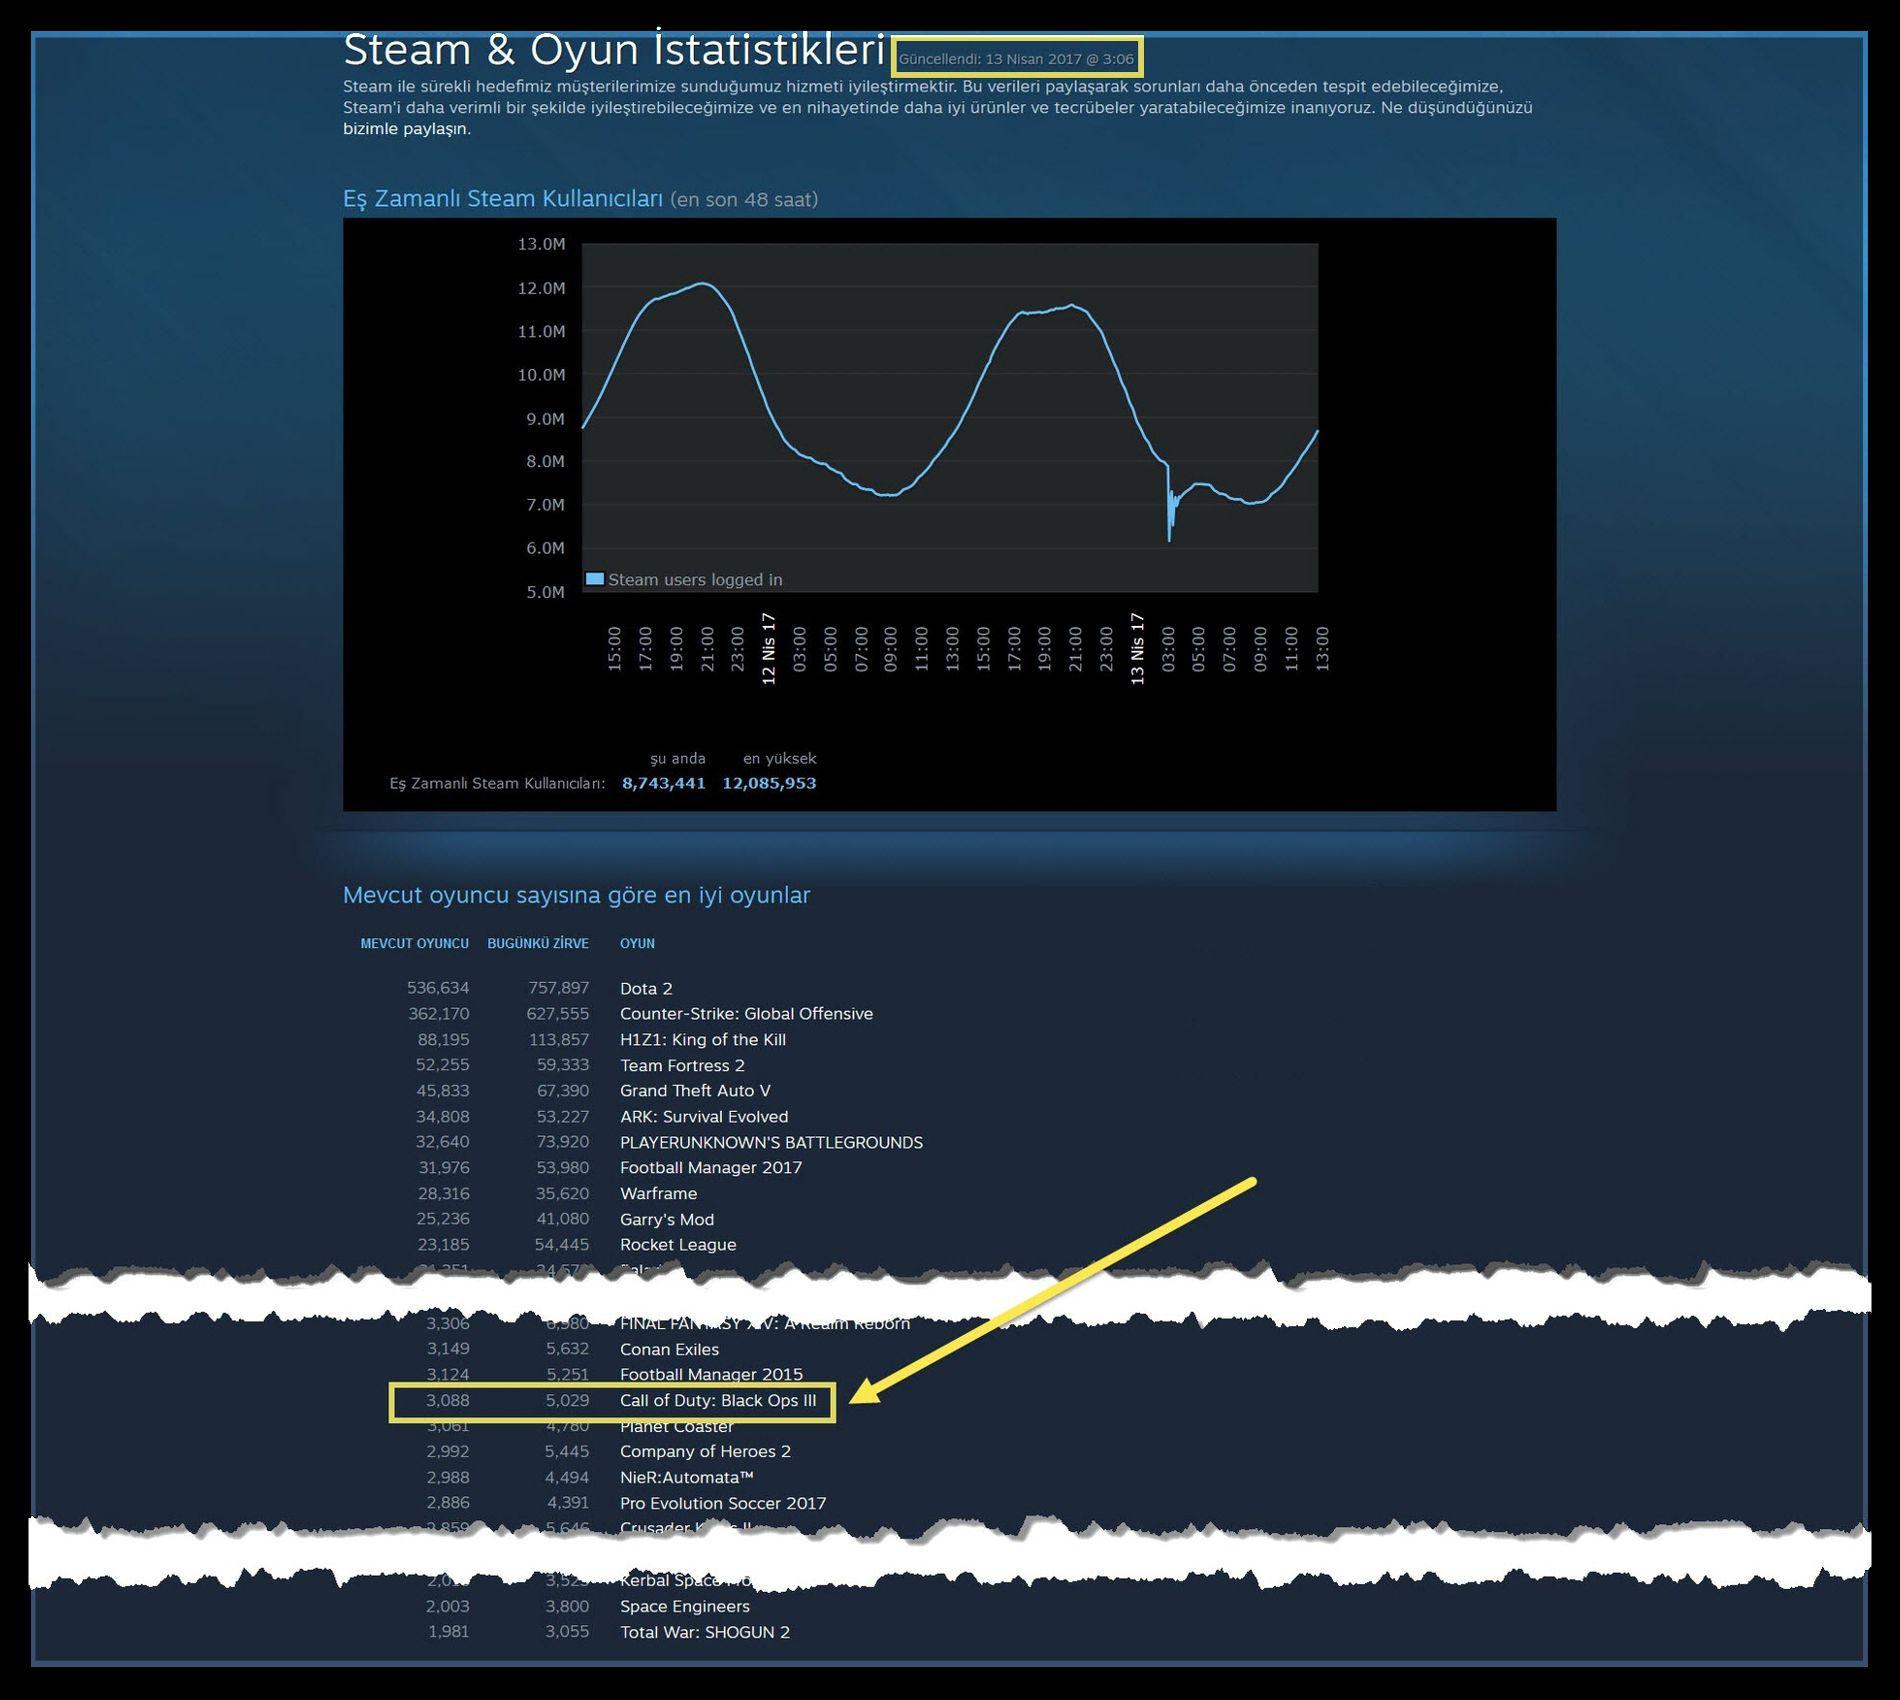 Steam & Oyun İstatistikleri